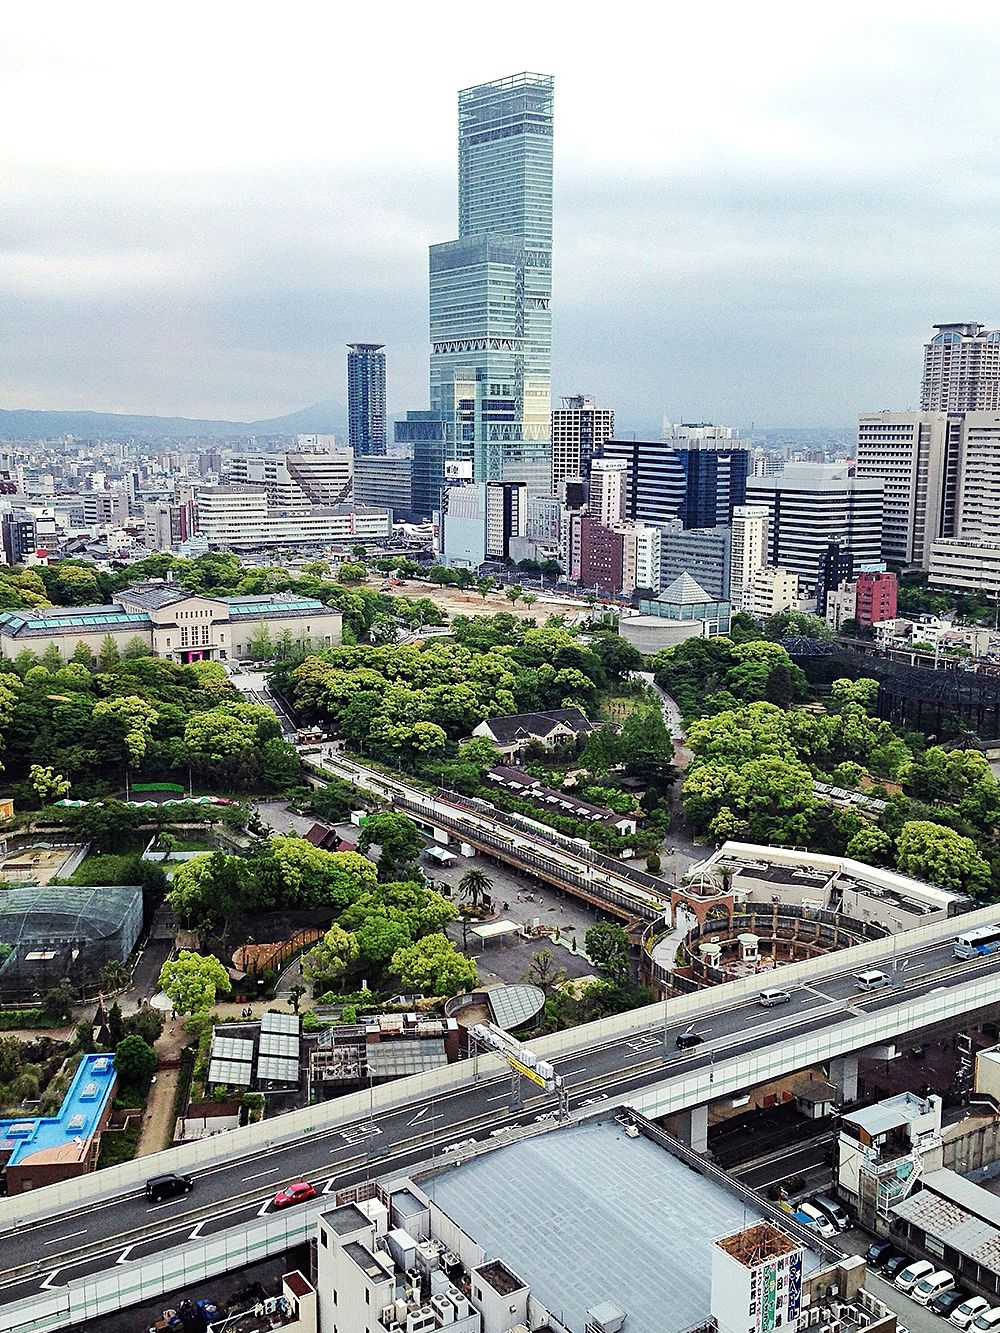 Abeno Harukas skyscraper in Osaka